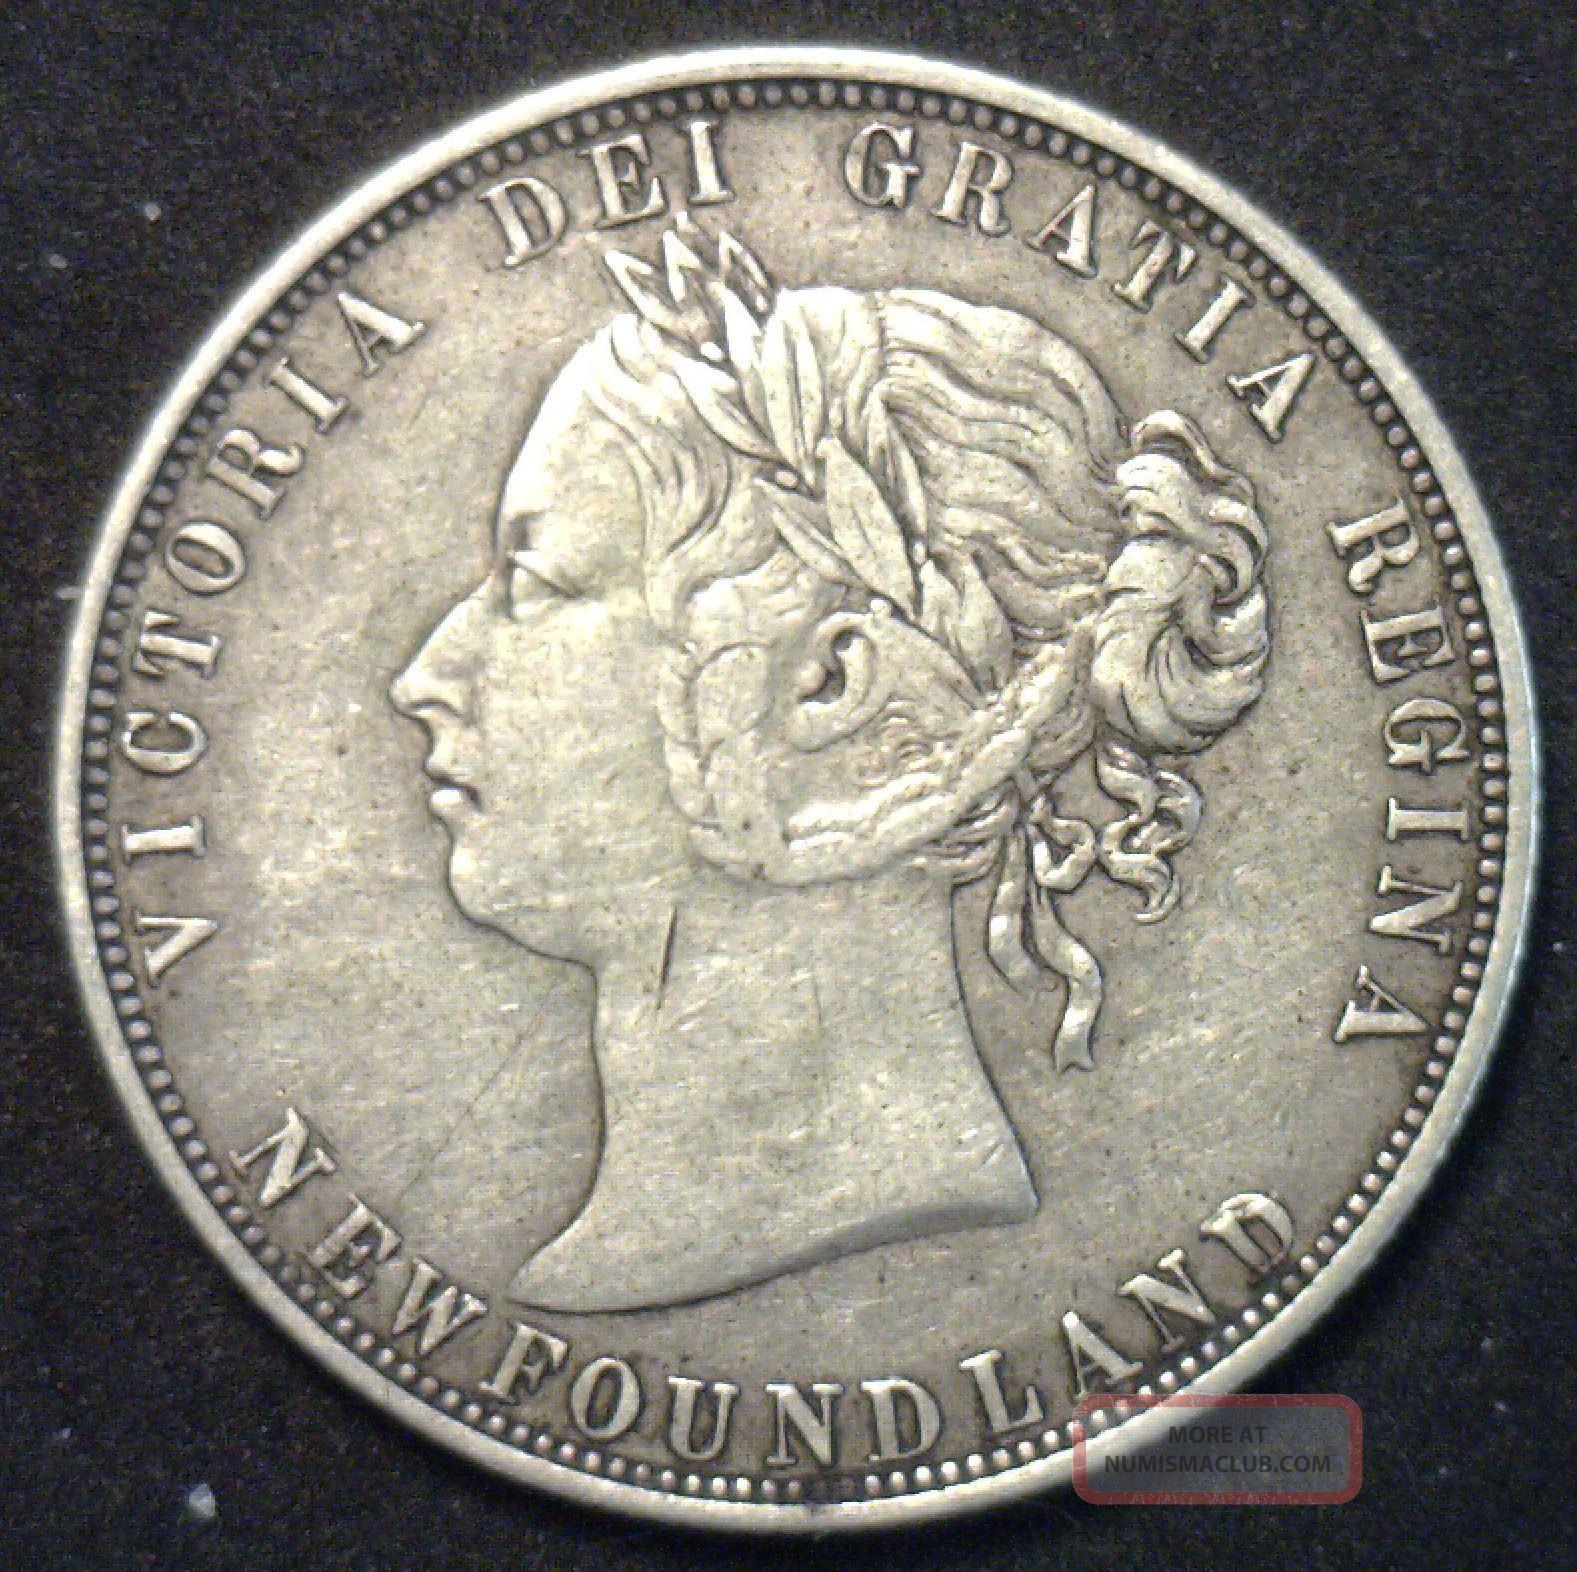 1874 Newfoundland 50 Cents Rare Grade Silver Coin Km 6